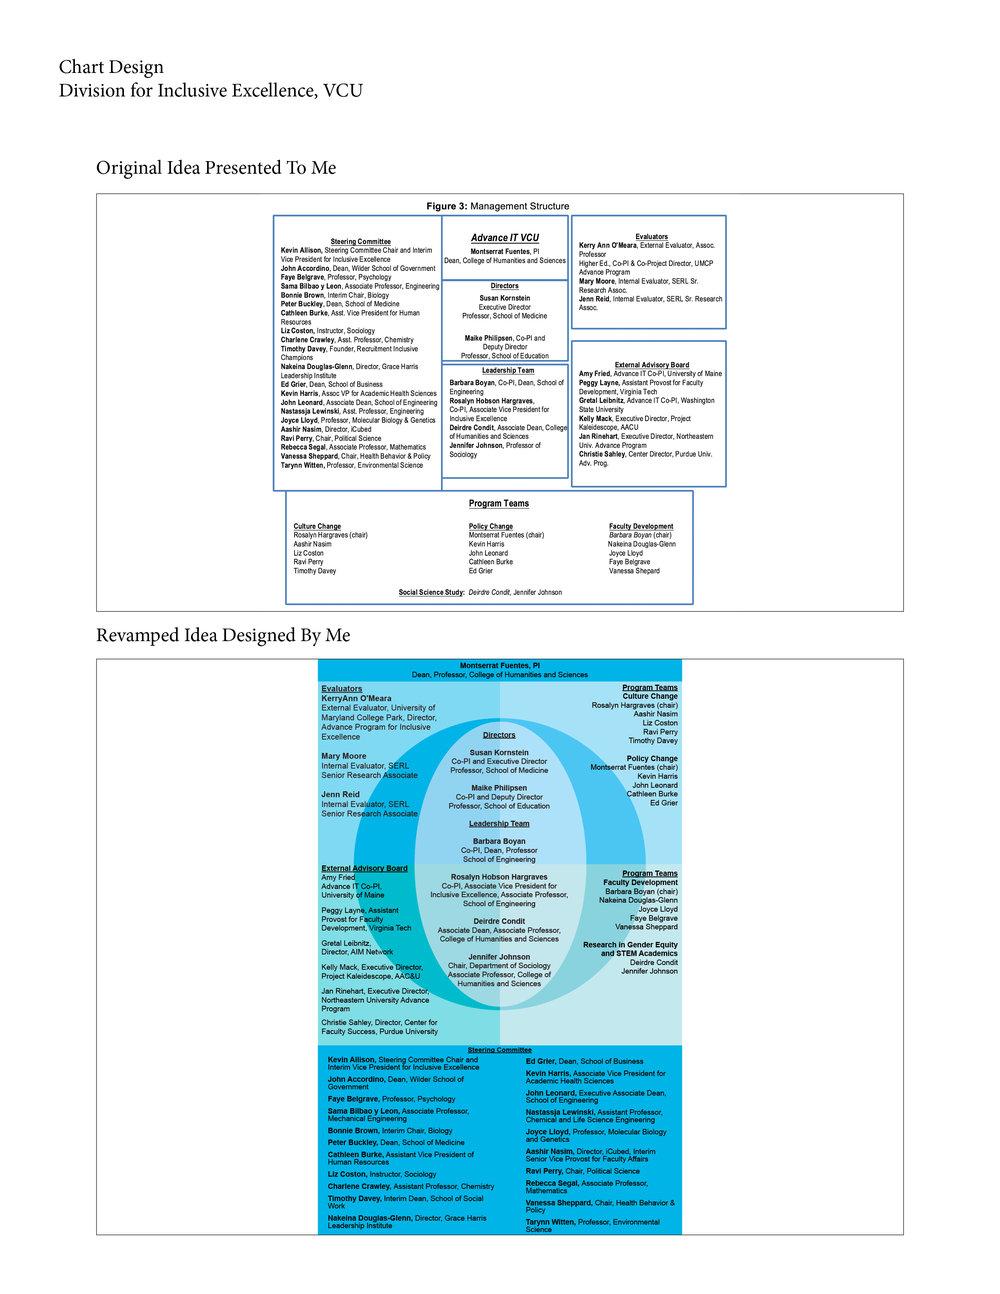 Selected Work - DLR4.jpg